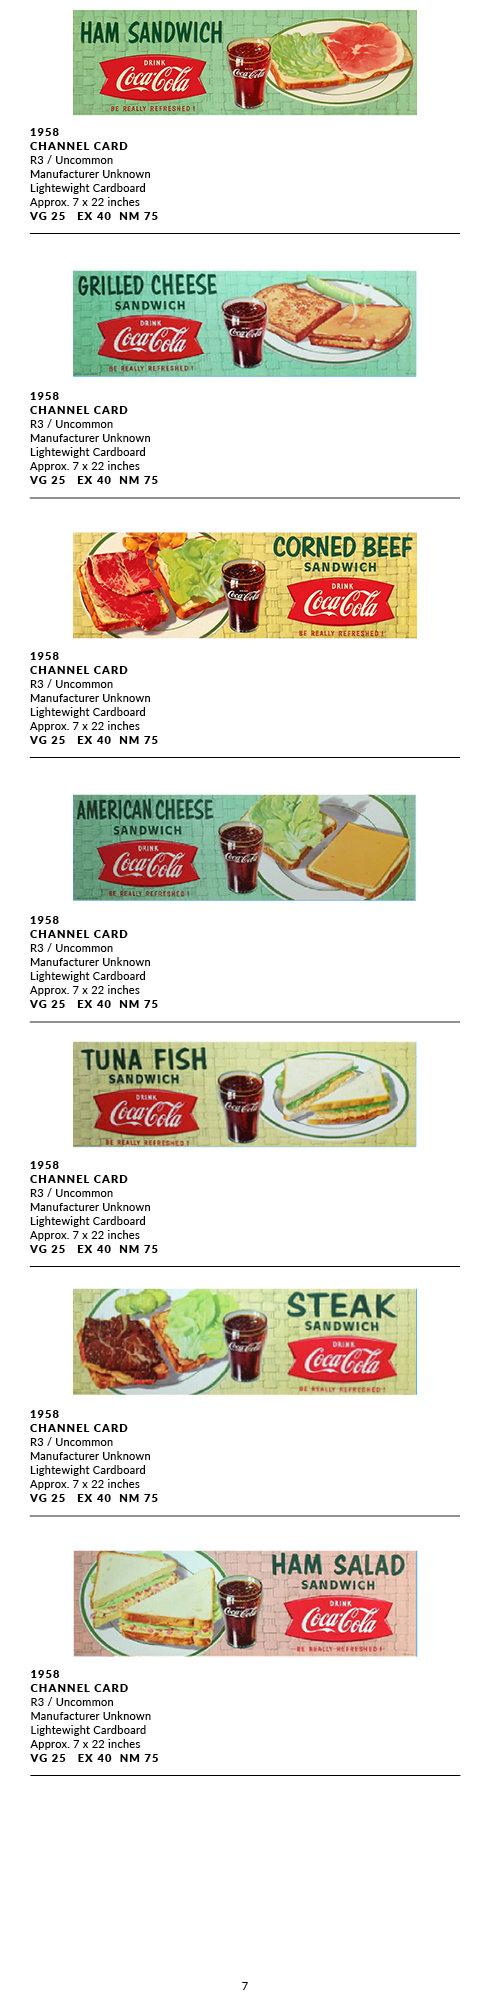 Food Channel Card7.jpg